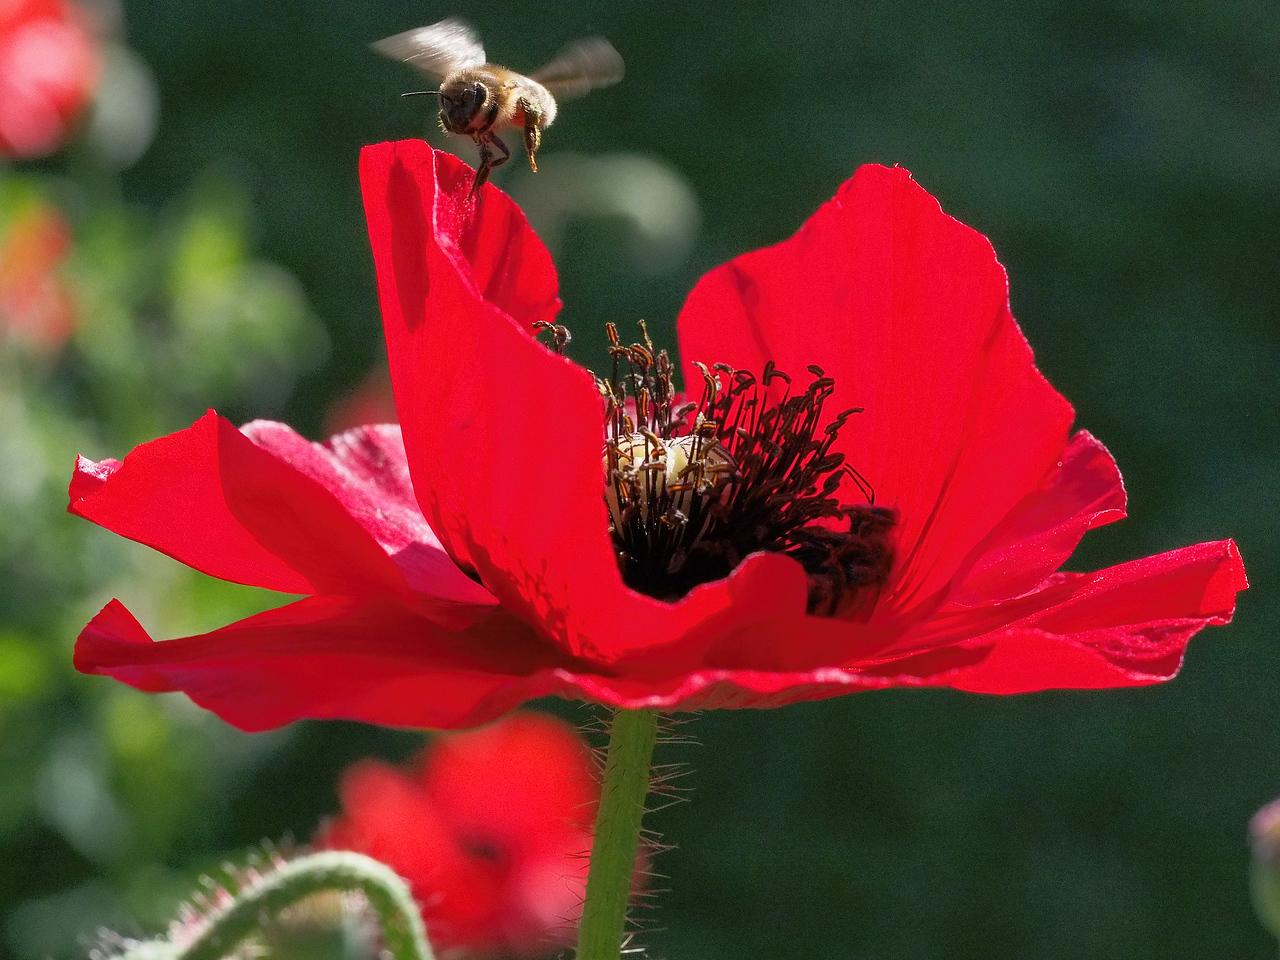 20131119_0714_9390 bee and poppy